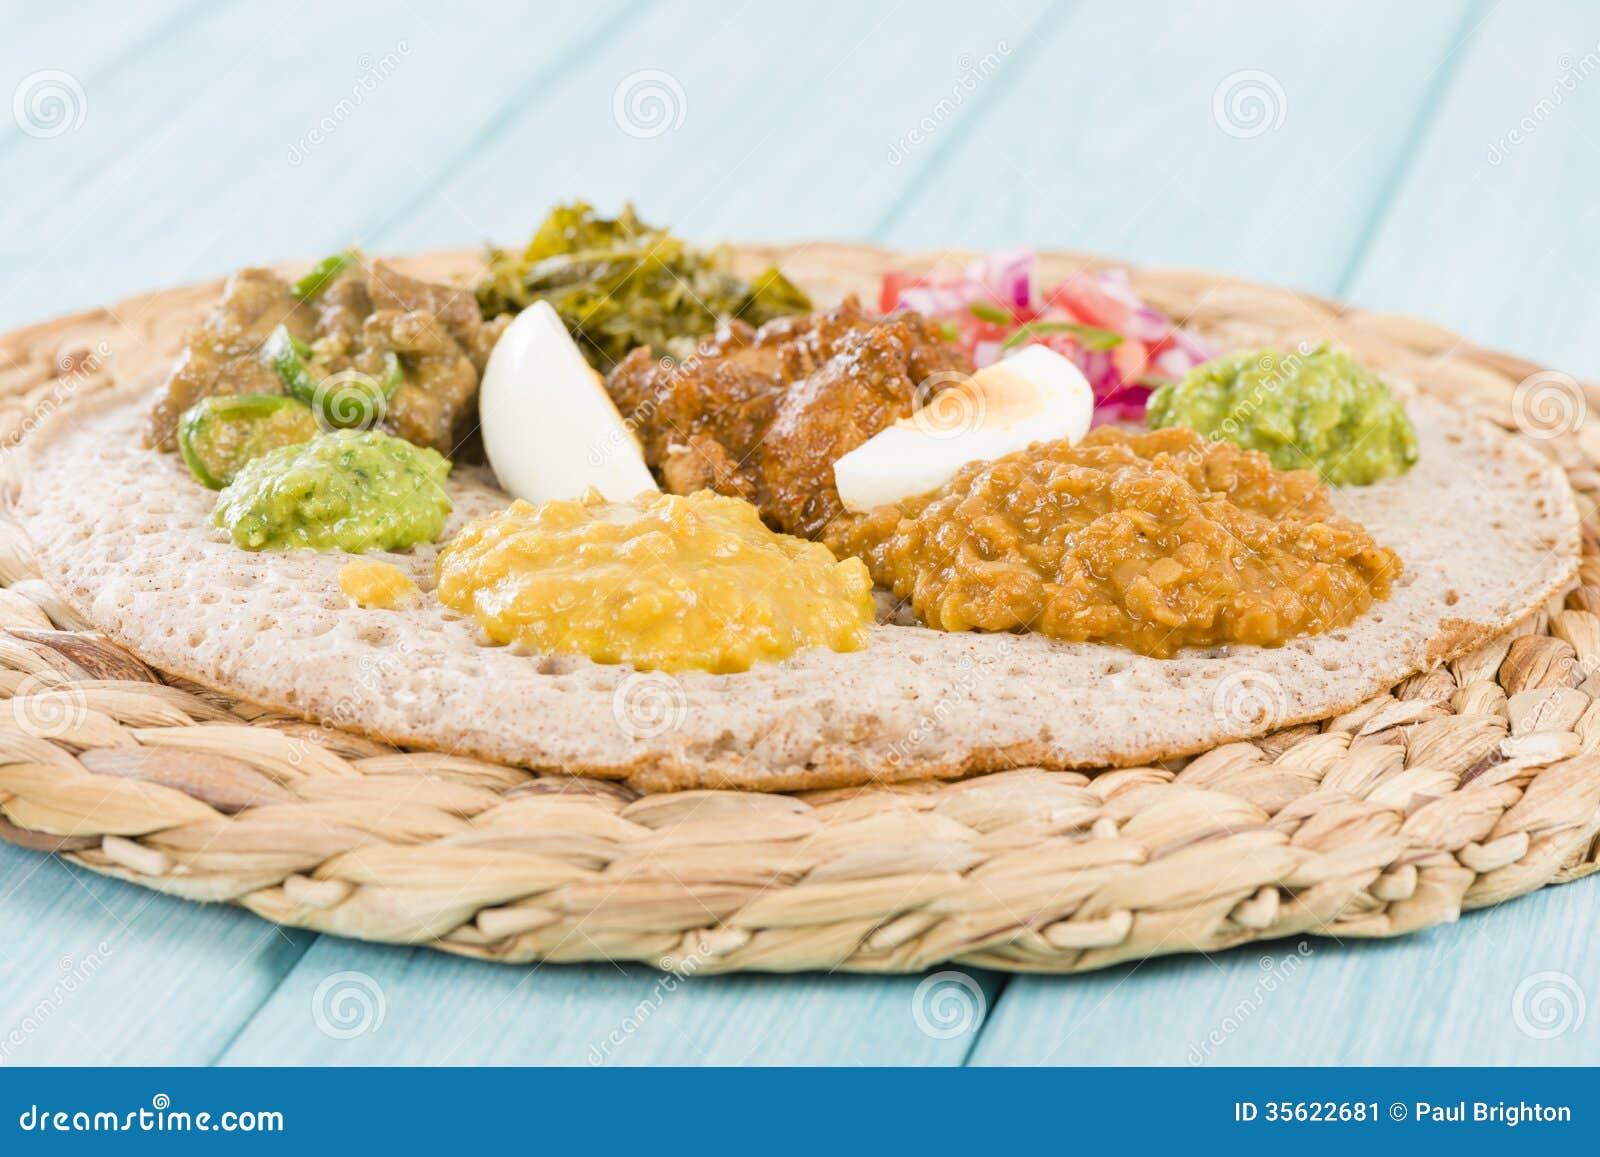 Ethiopian Feast - Injera (sourdough flatbread) with doro wat (red ...